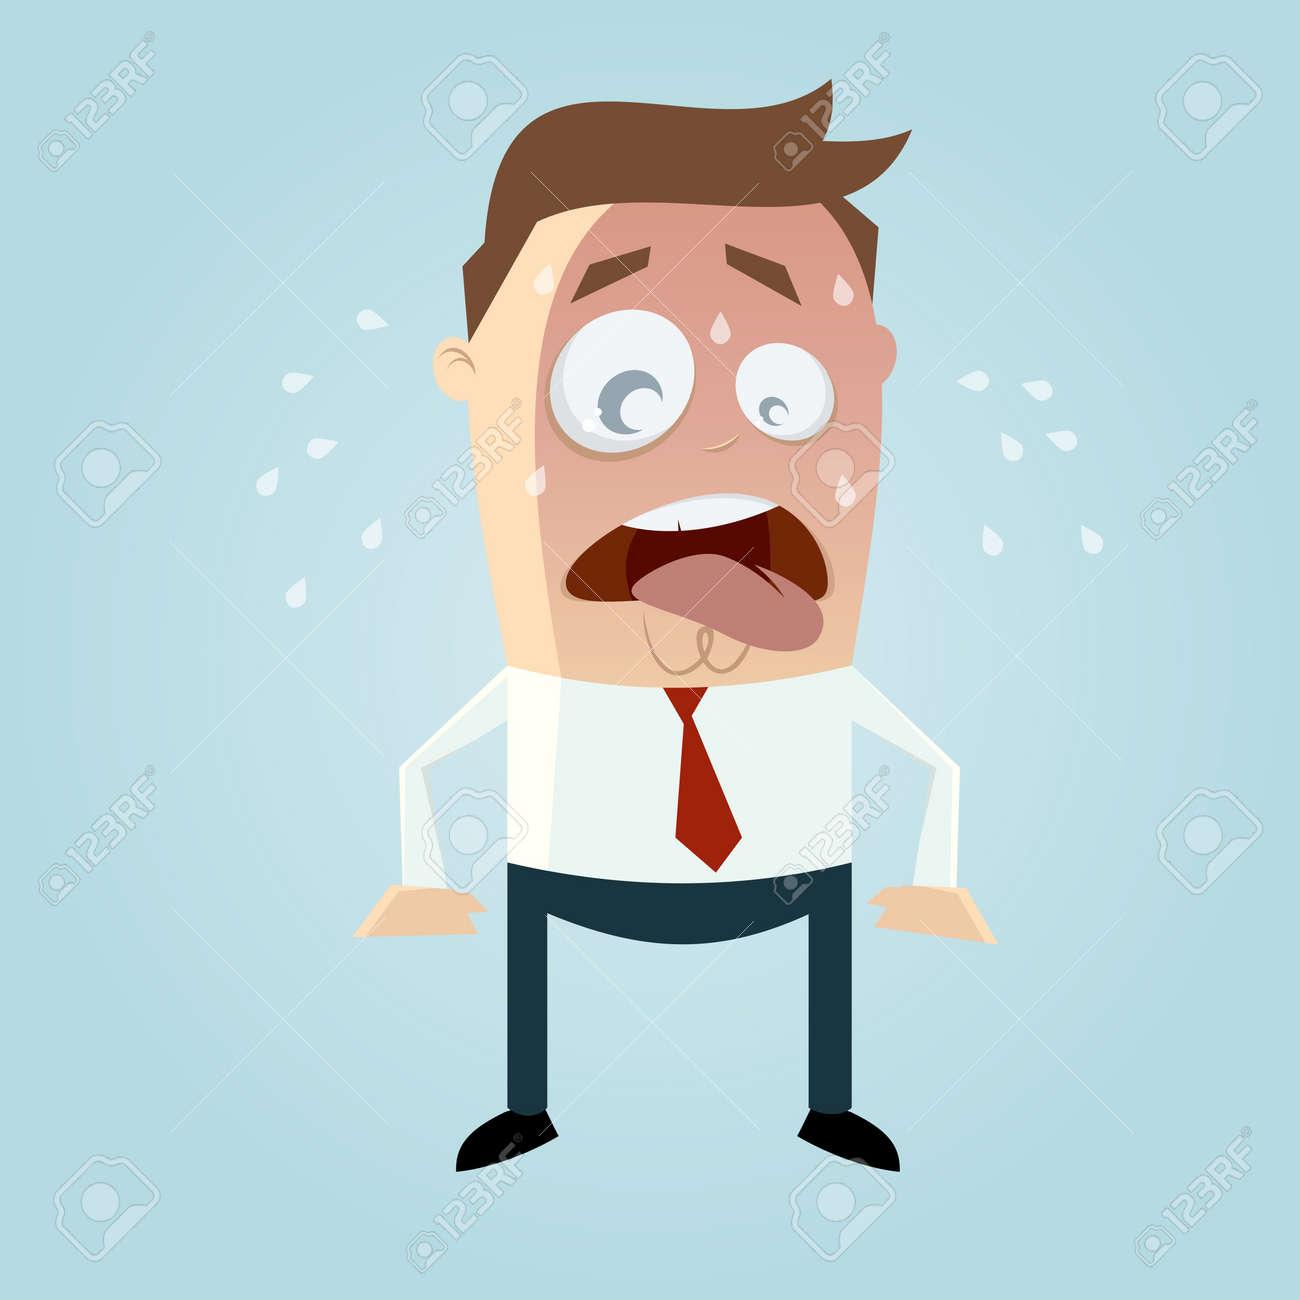 funny cartoon man is sweating Standard-Bild - 20104247